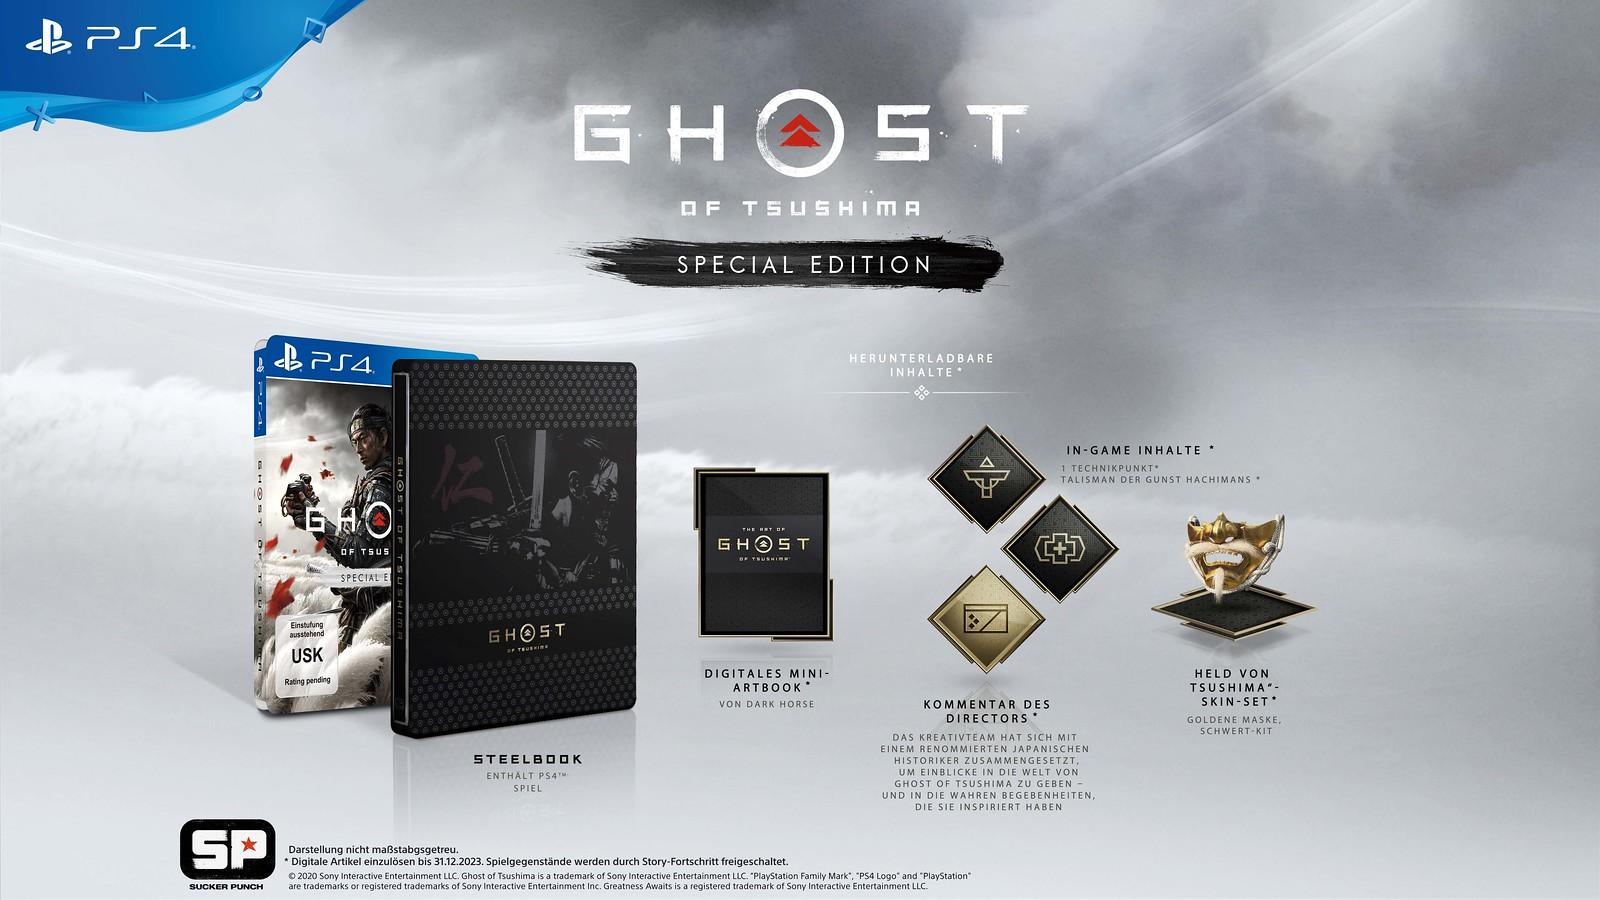 49621951393 ca68f40c6f h - Ghost of Tsushima erscheint am 26. Juni: Collector's & Digital Deluxe Edition im Detail